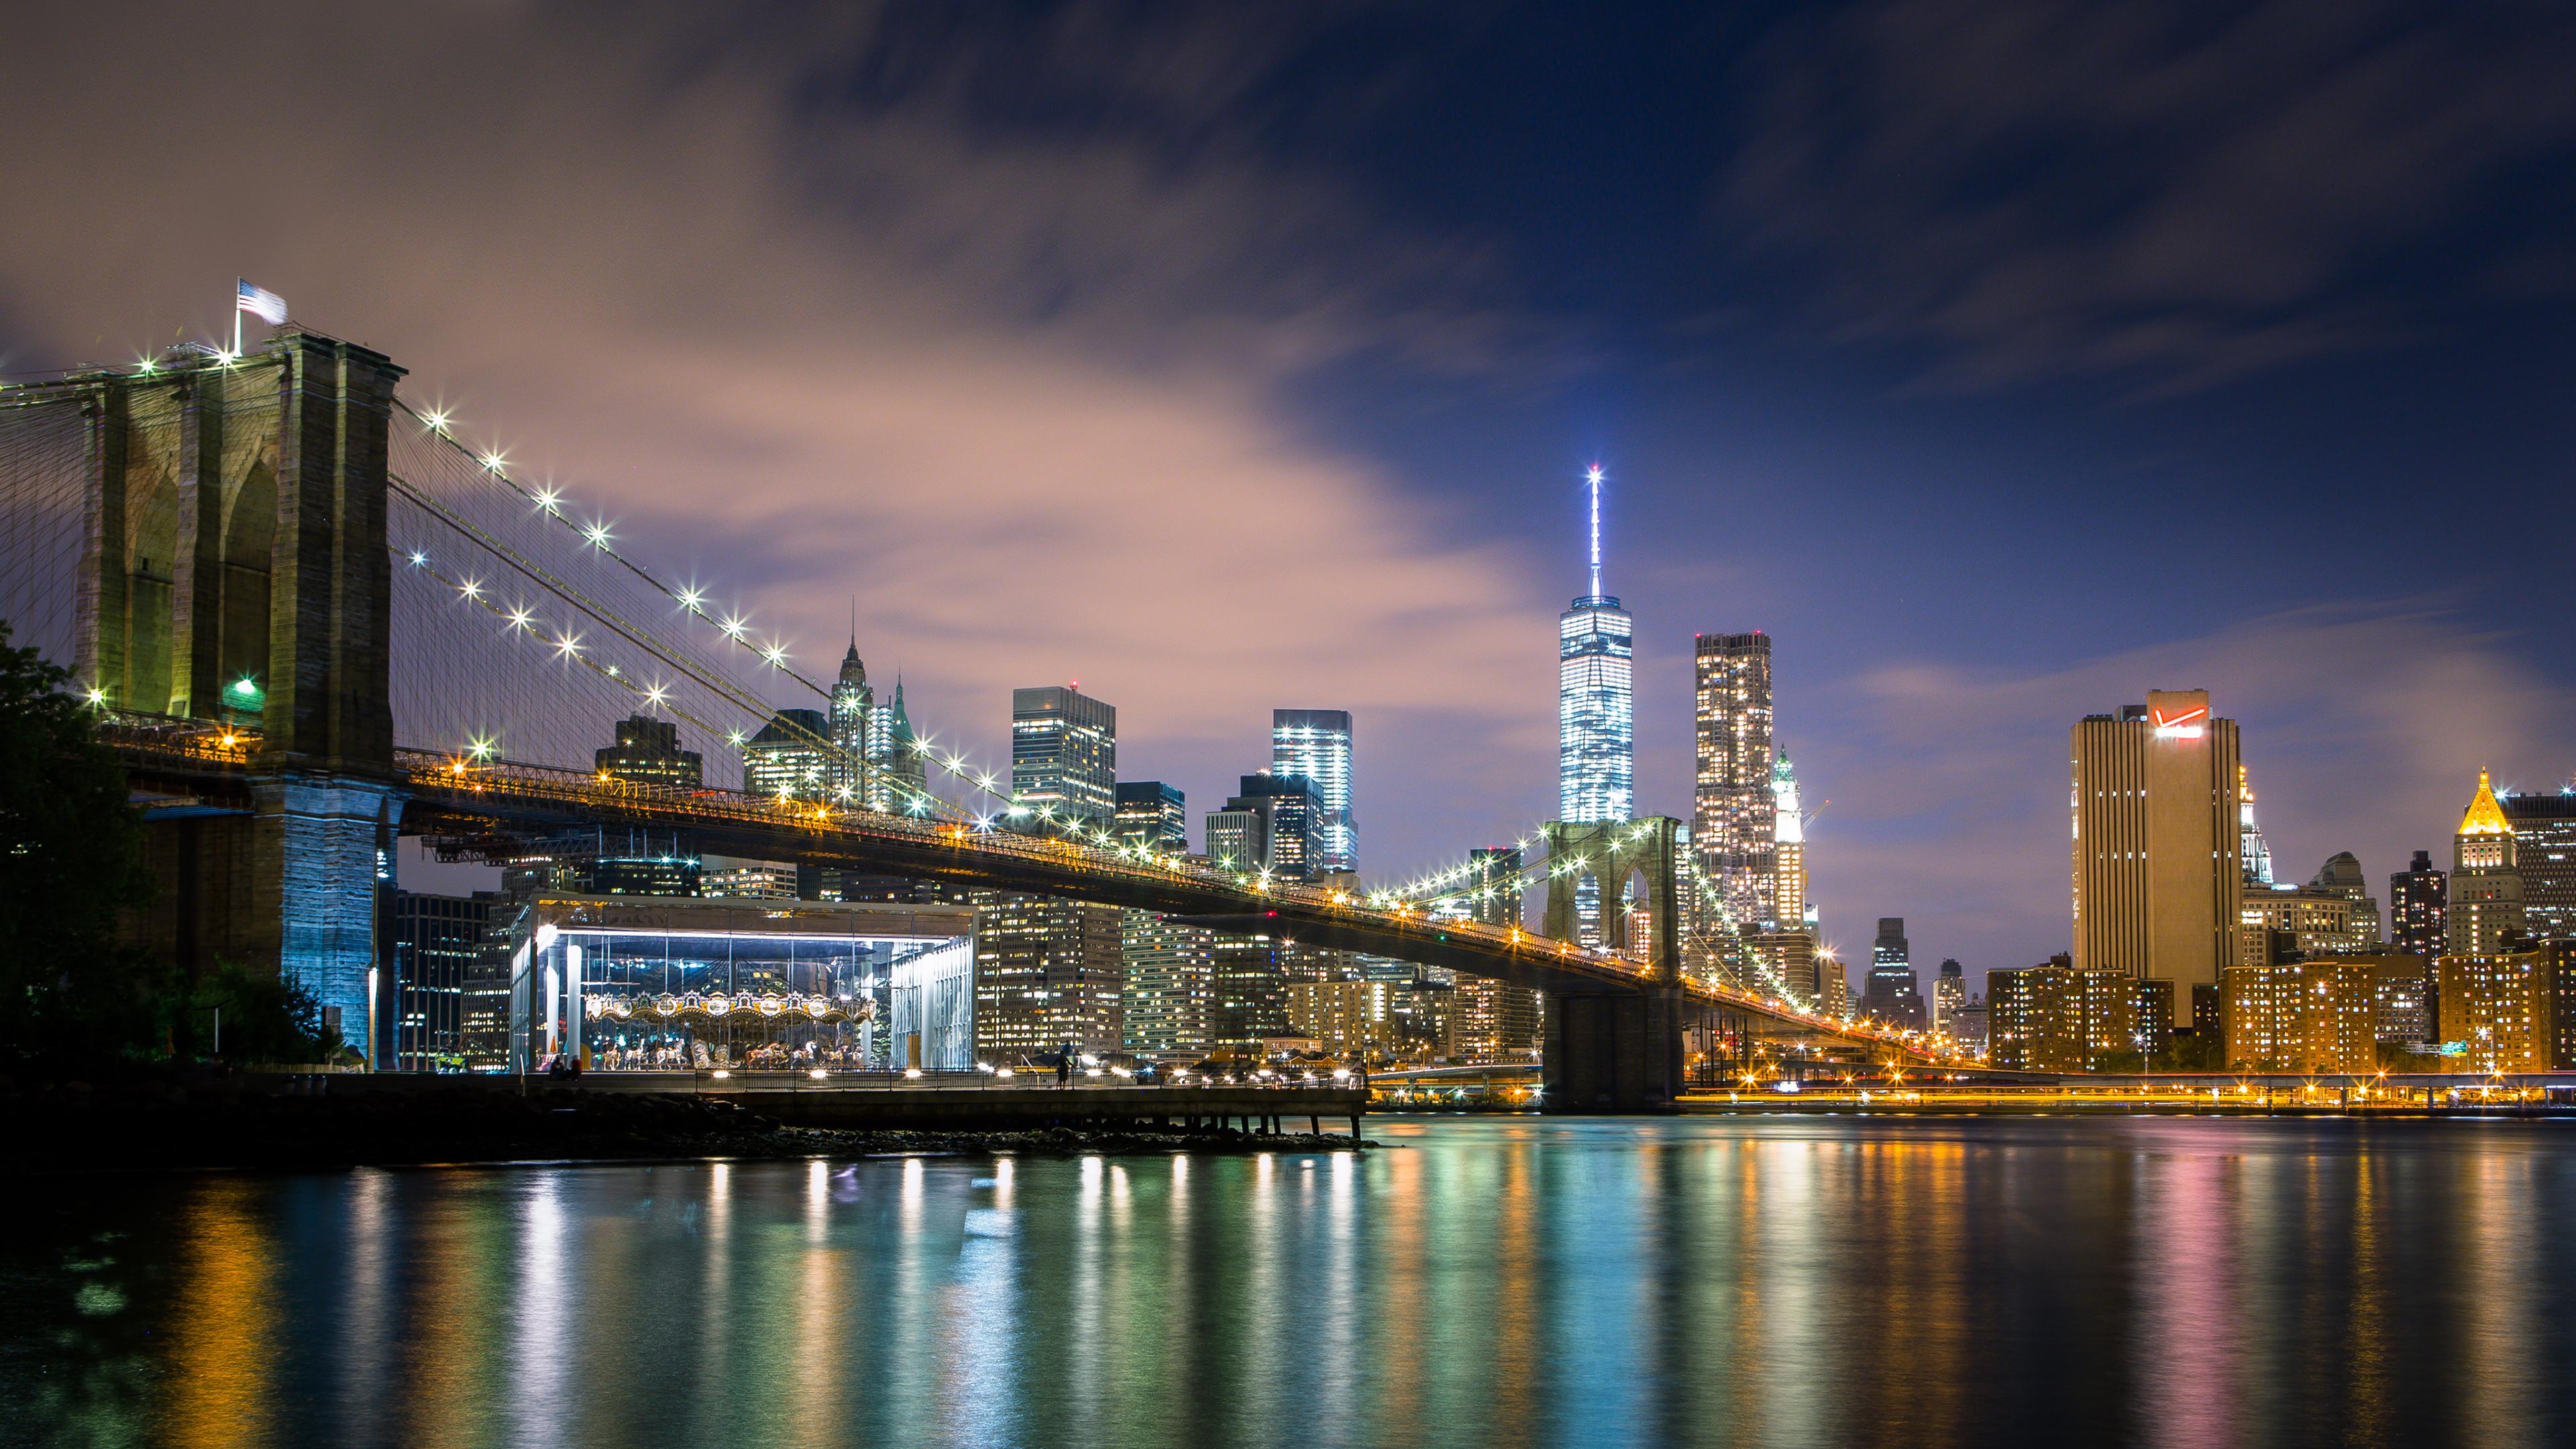 30+ New York Wallpaper Hd 4K Pics